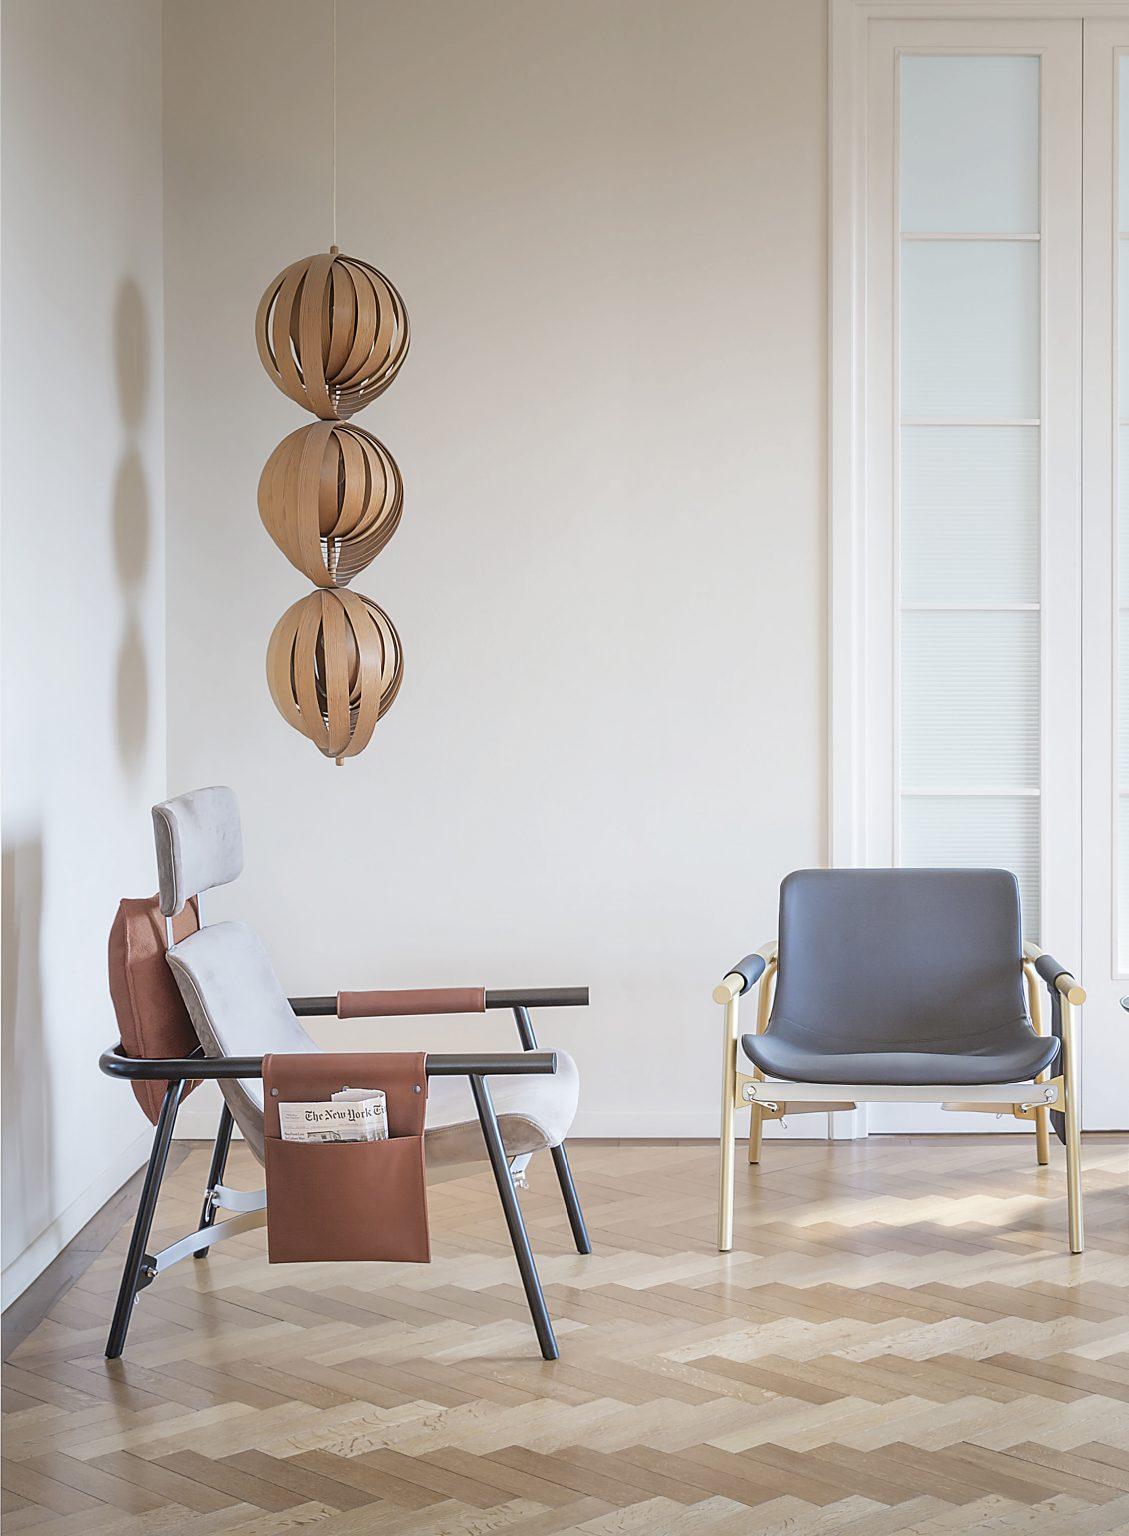 Biennale Interieur - Belgium's leading design and interior event - Remind_eddy-up-eddy.jpg